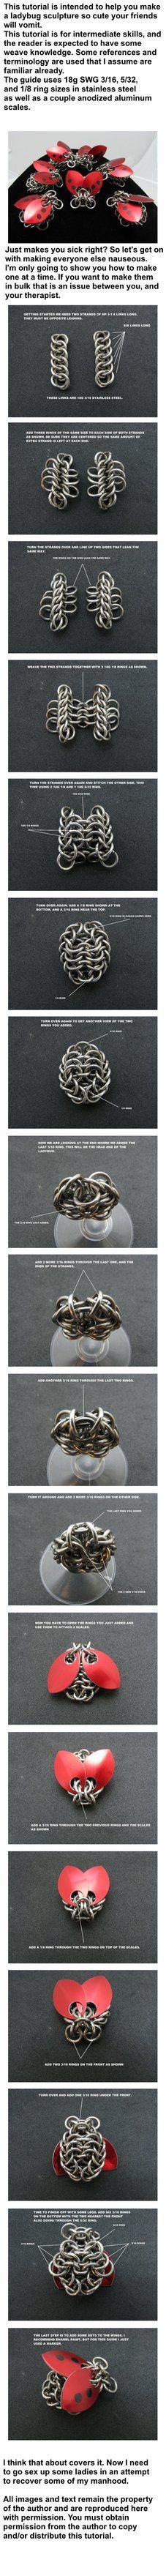 Ladybug Sculpture Tutorial by BorealisMetalWorks.deviantart.com on @DeviantArt